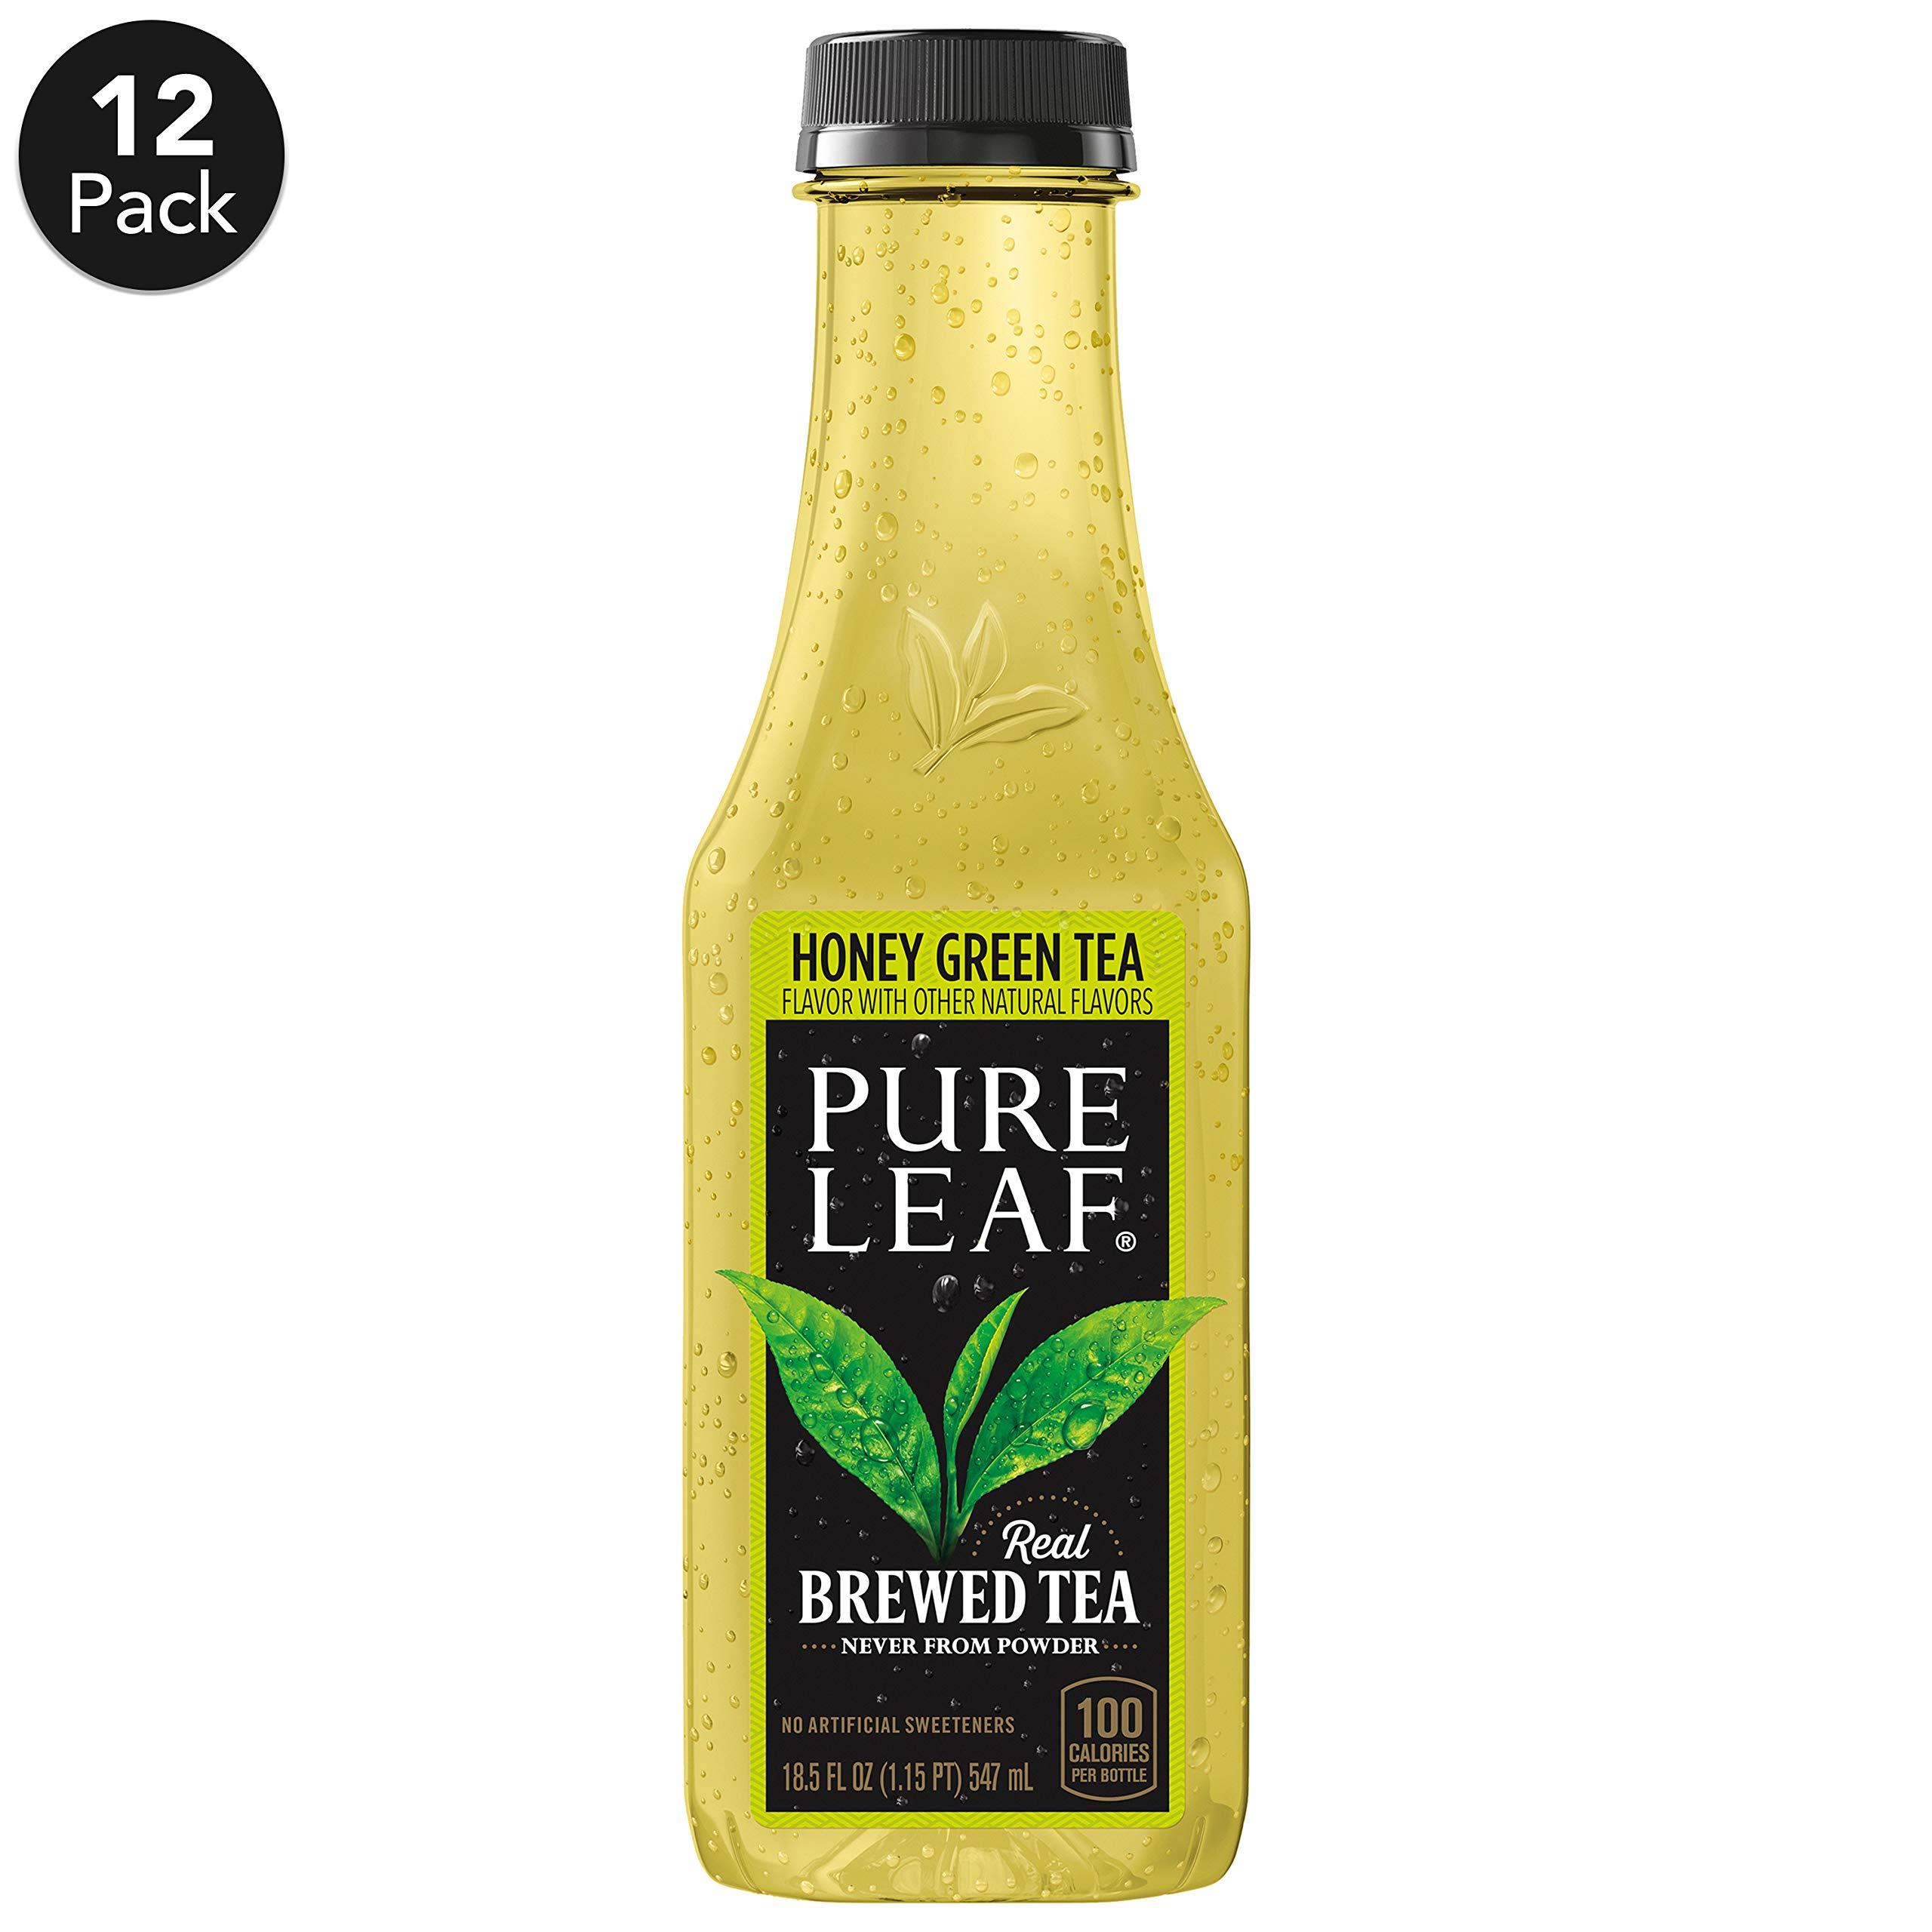 Pure Leaf Iced Tea, Not Too Sweet, Real Brewed Honey Green Tea, 18.5  Fl Oz, Pack of 12